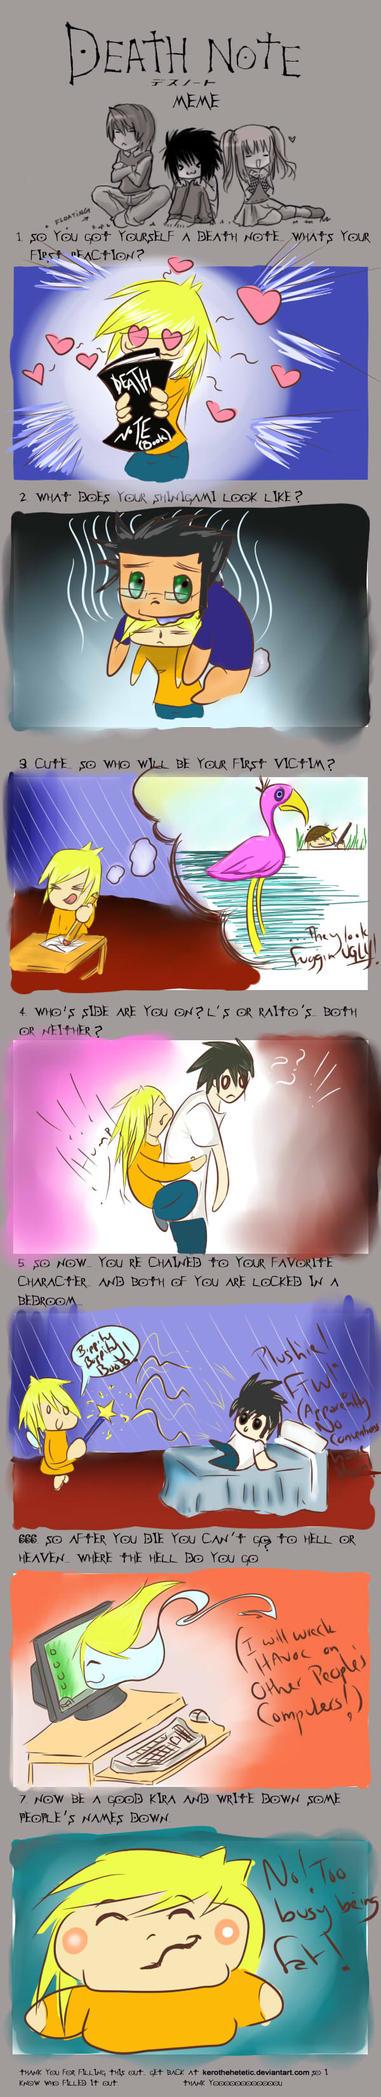 Death Note Meme by Phreakobnature